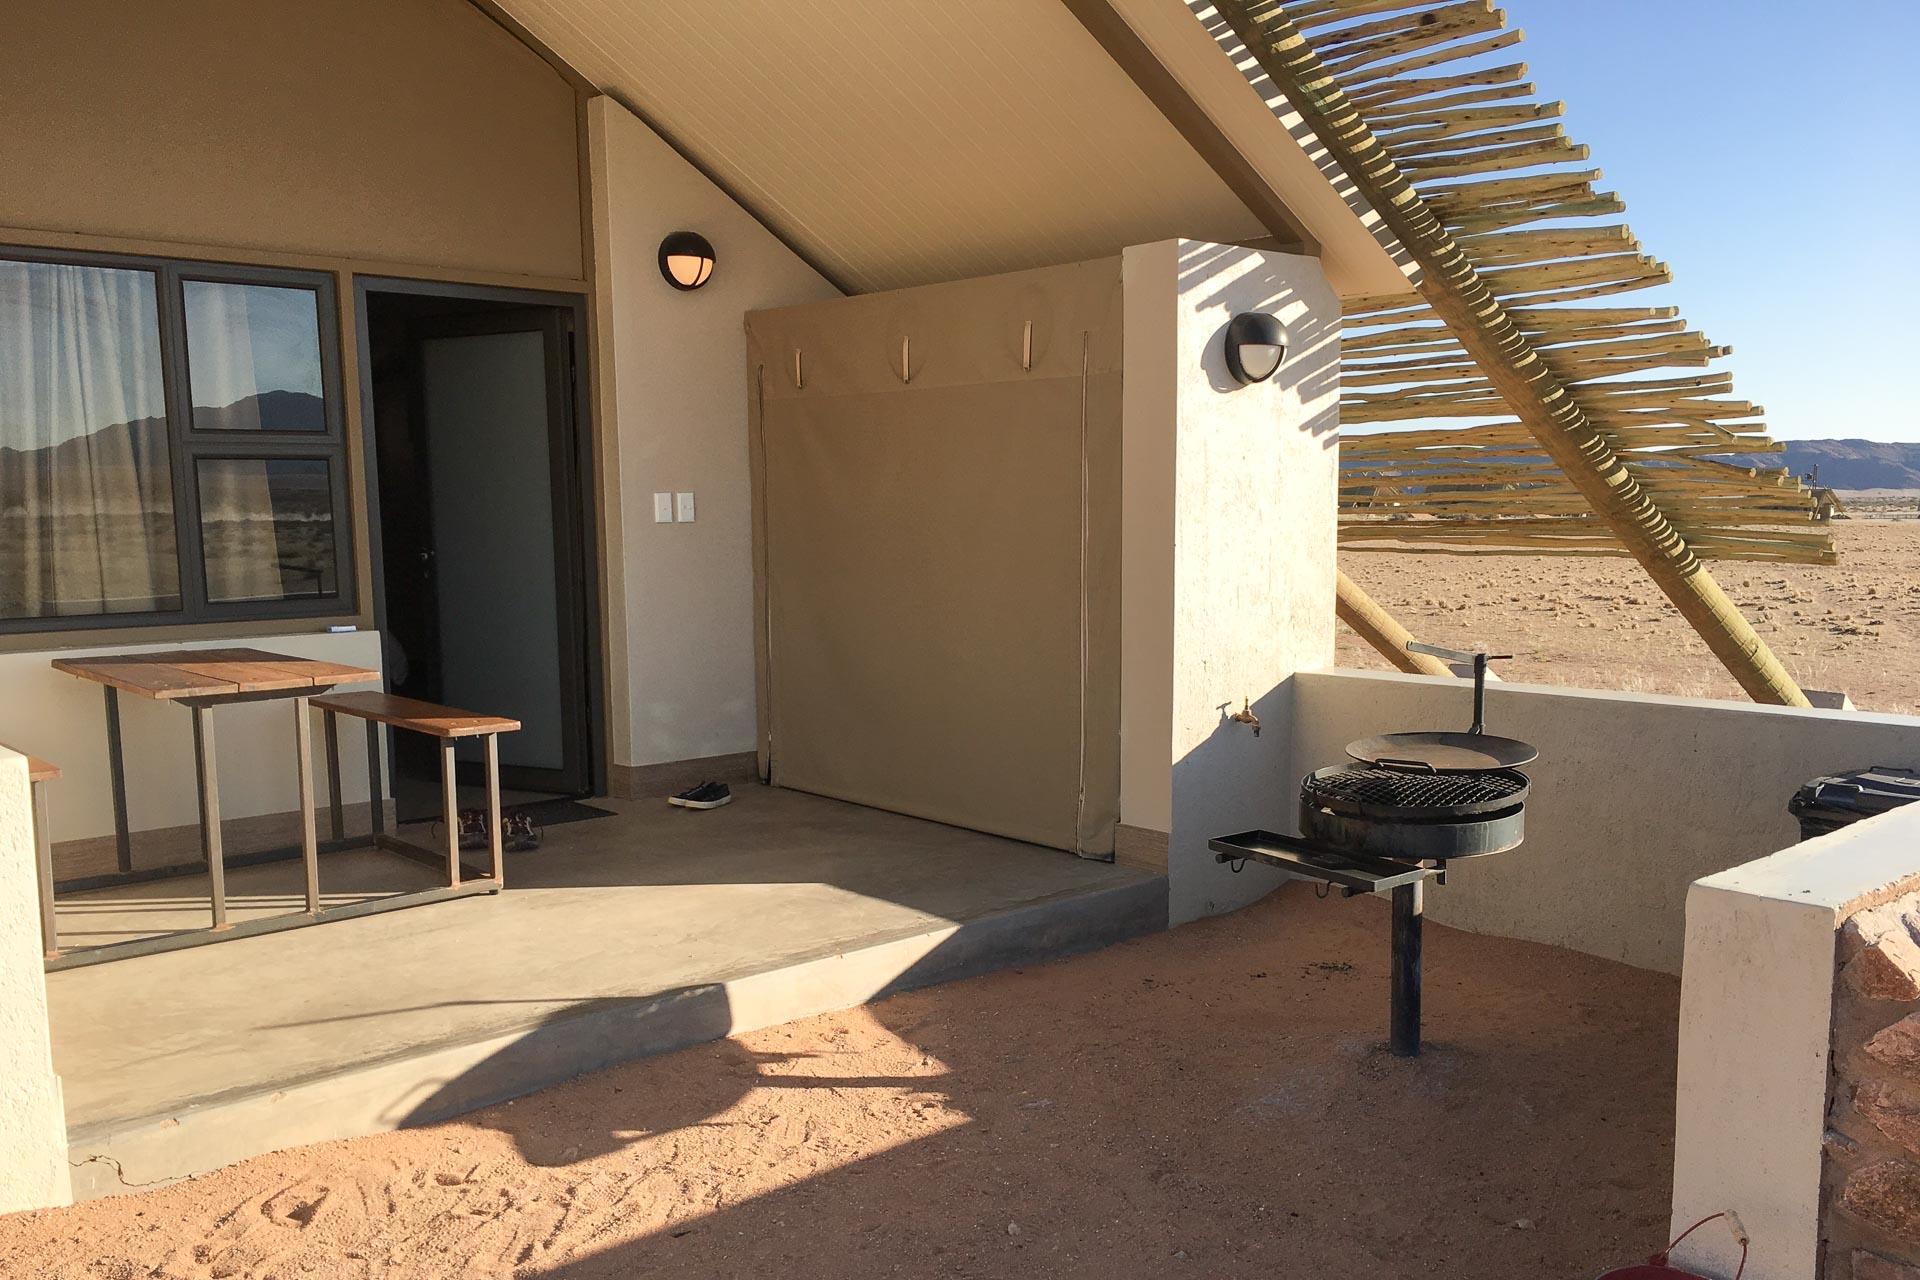 Desert-Quiver-Camp-Namibia-Globetrotter-Select-13